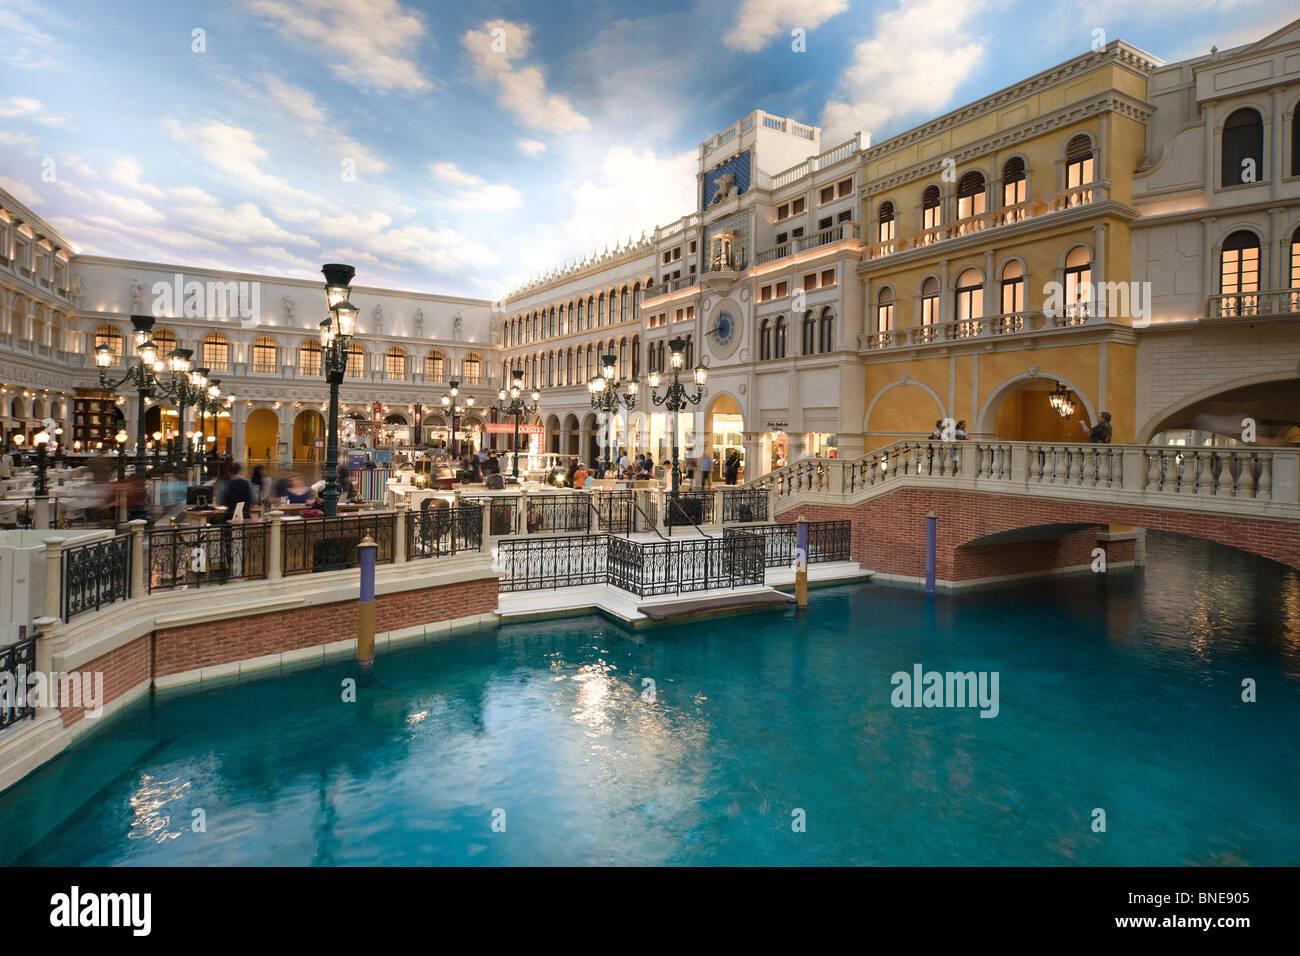 The Venetian Las Vegas Replica Venice Setting Canal Water